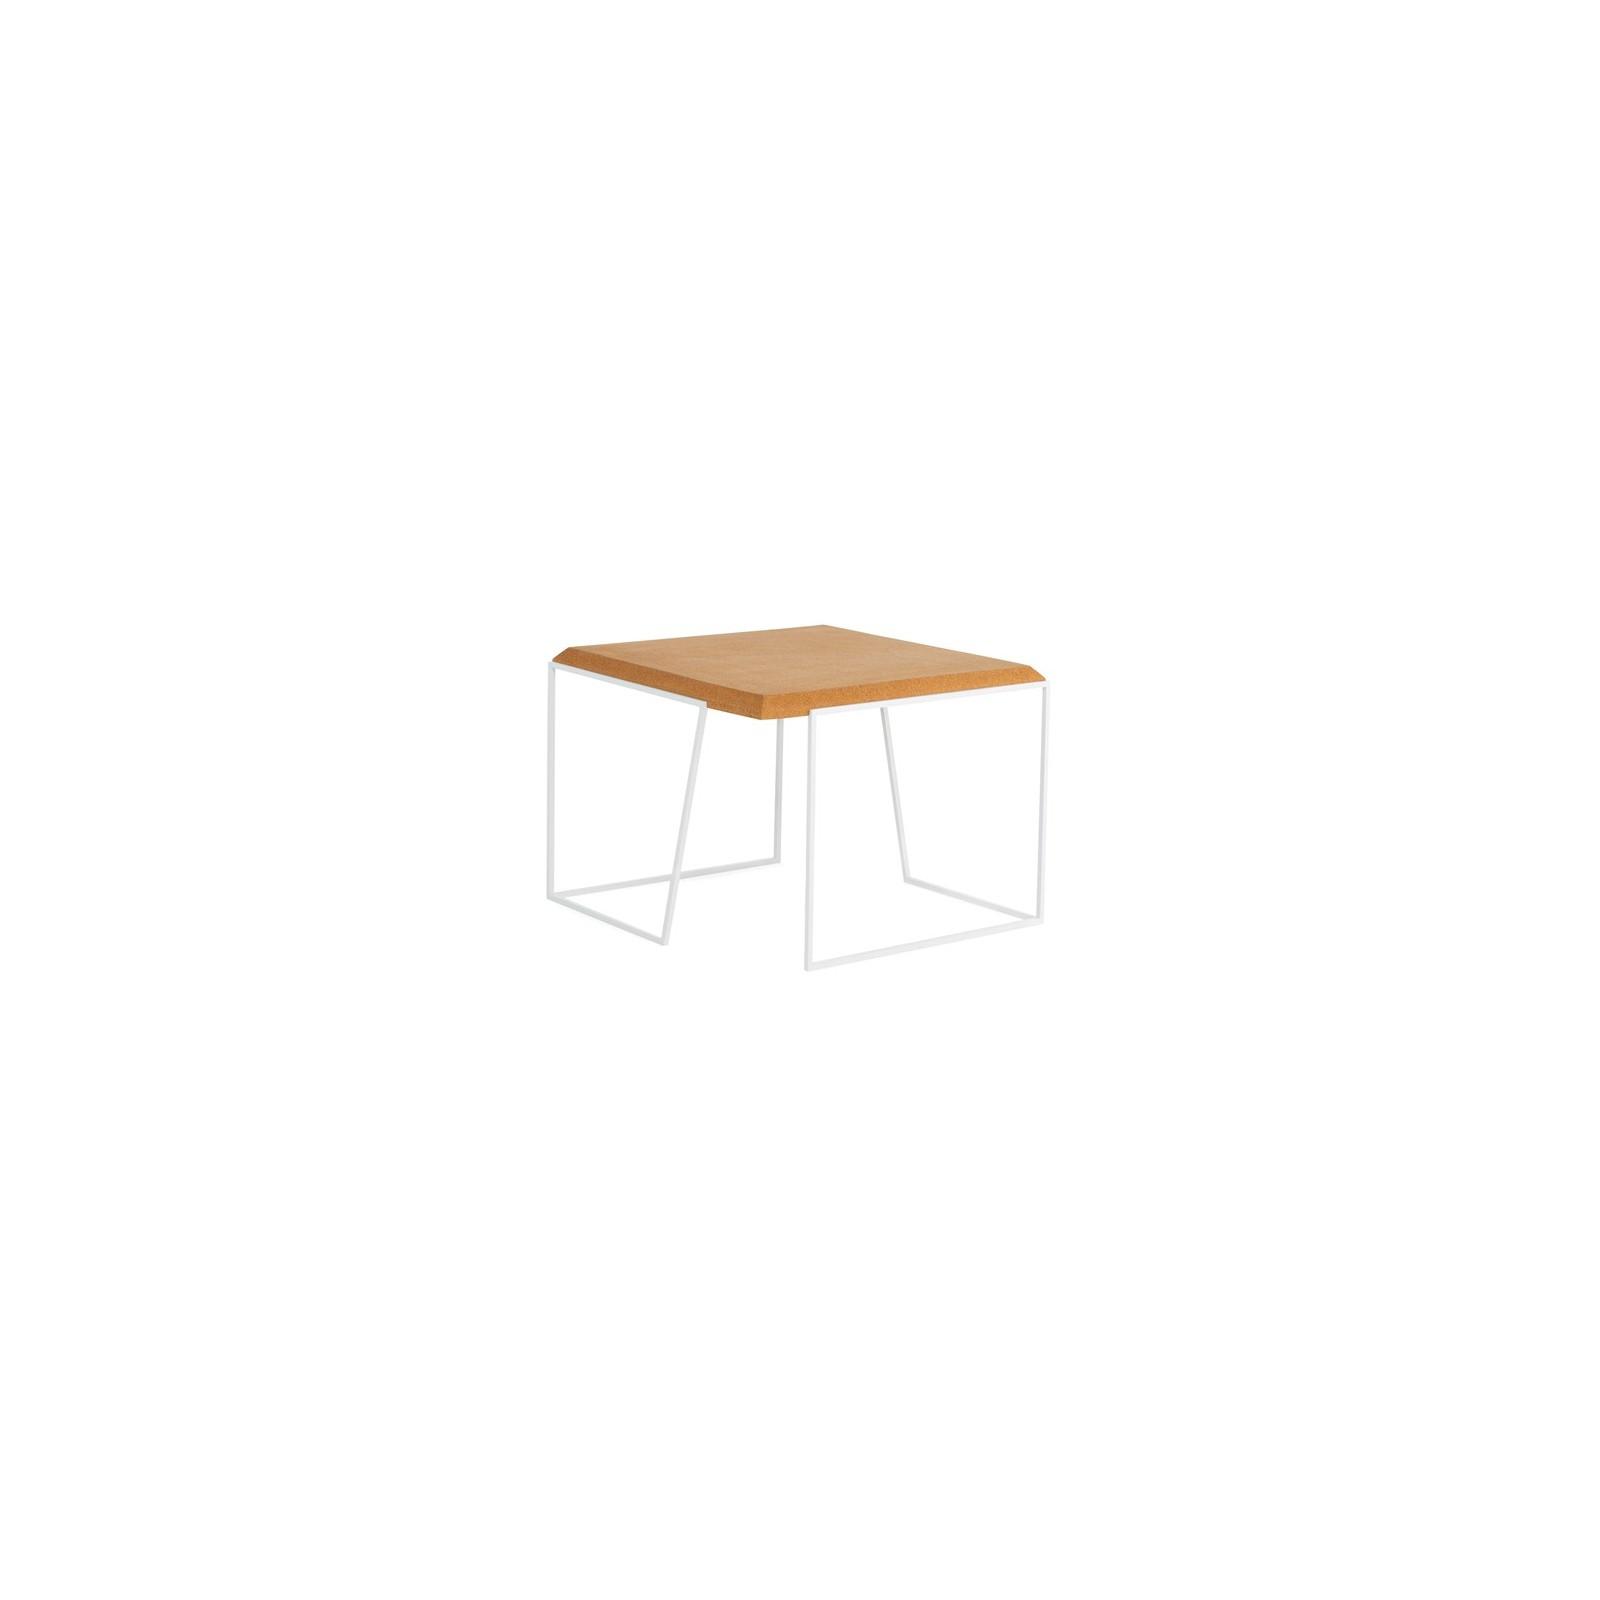 Table Basse Liège Blanche Arne Concept